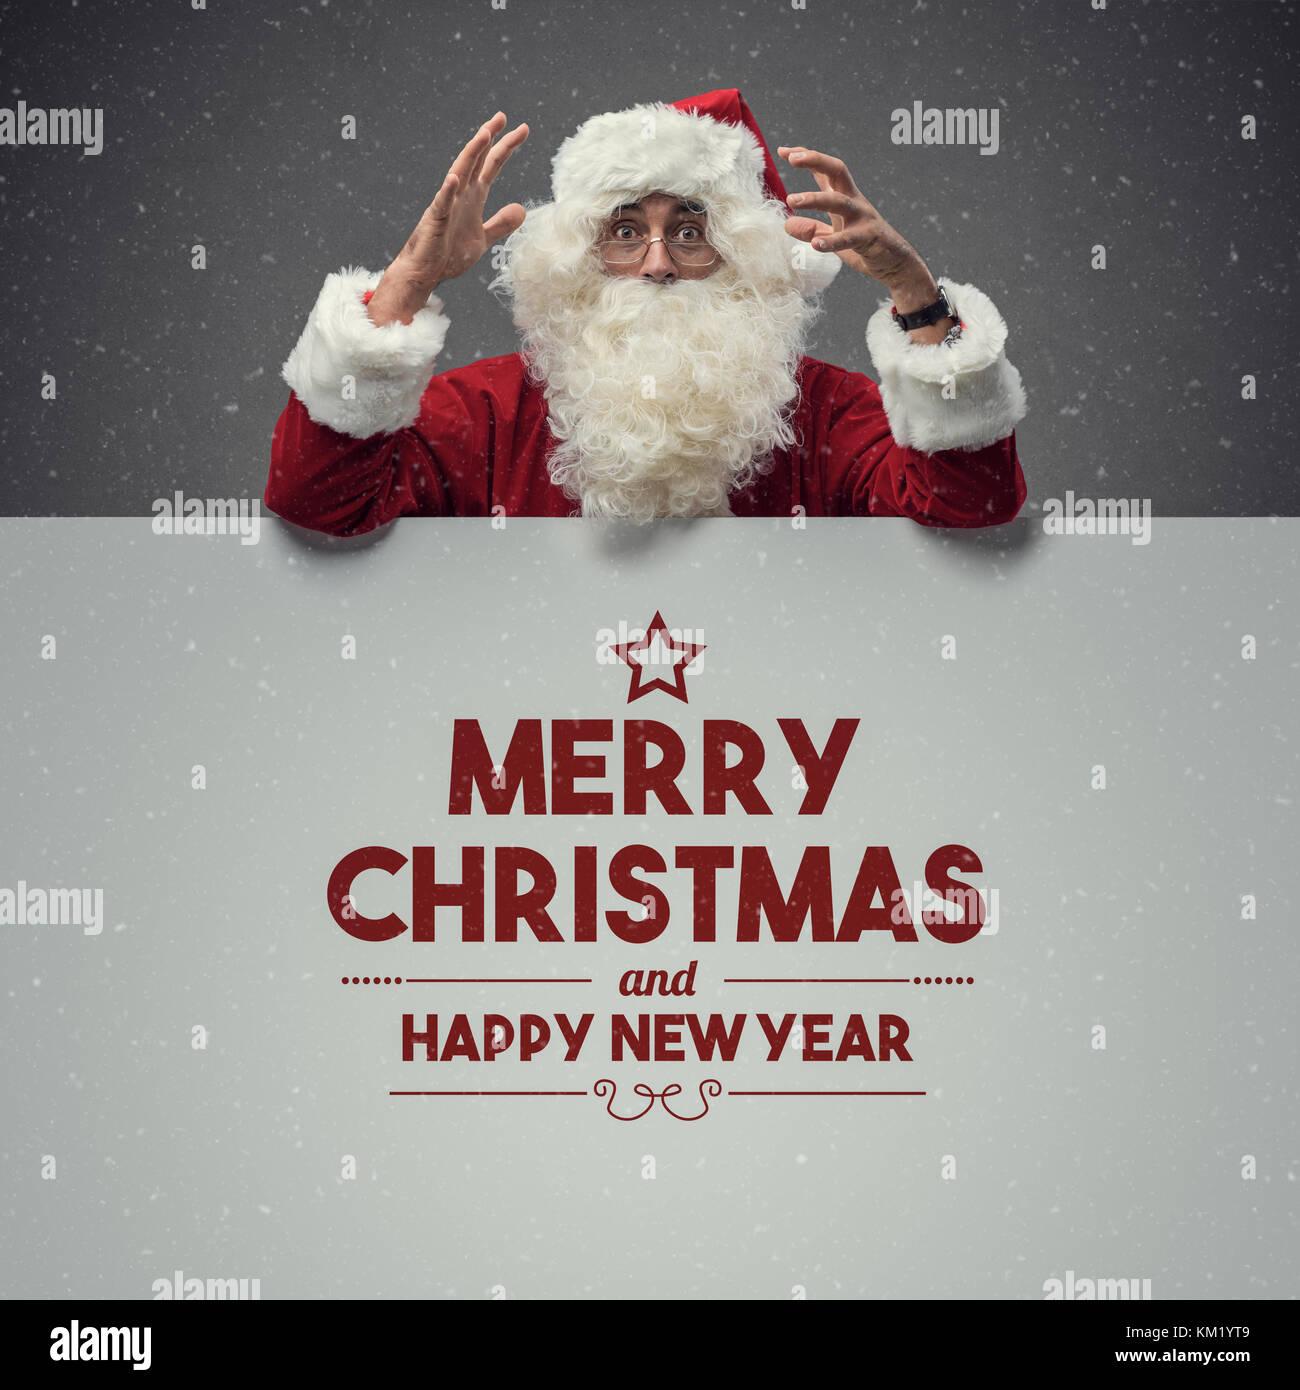 Cheerful happy Santa Claus wishing a joyful merry Christmas and snow falling - Stock Image